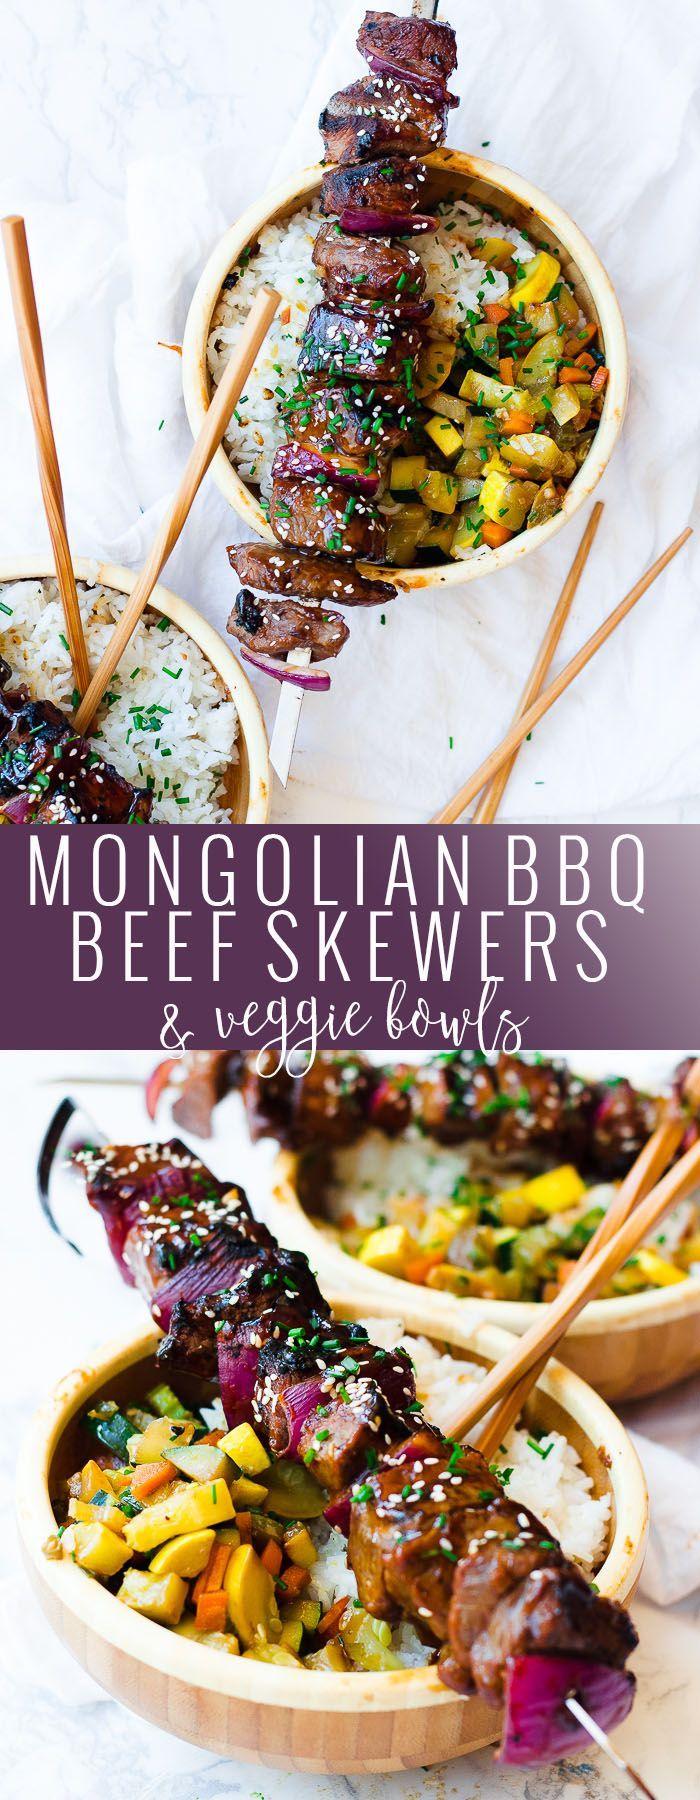 Mongolian BBQ Beef Skewers & Veggie Bowls   homemade asian inspired recipes   healthy asian recipes   easy skewer recipes   homemade beef skewers    Oh So Delicioso #ad #mongolianbeef #beefskewers #asianrecipes @pfchangshomemenu